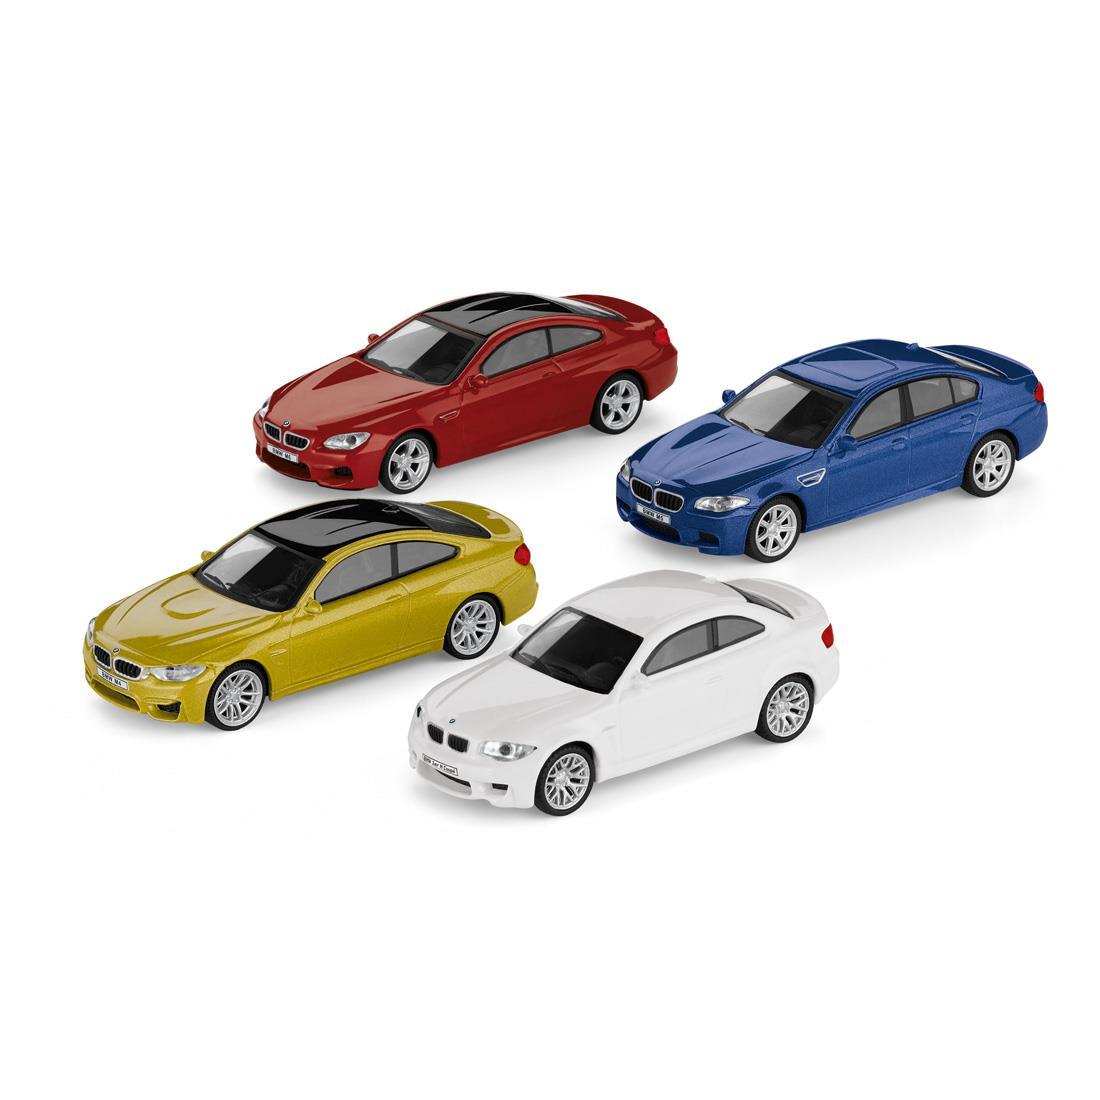 ShopBMWUSA.com: BMW M CAR COLLECTION